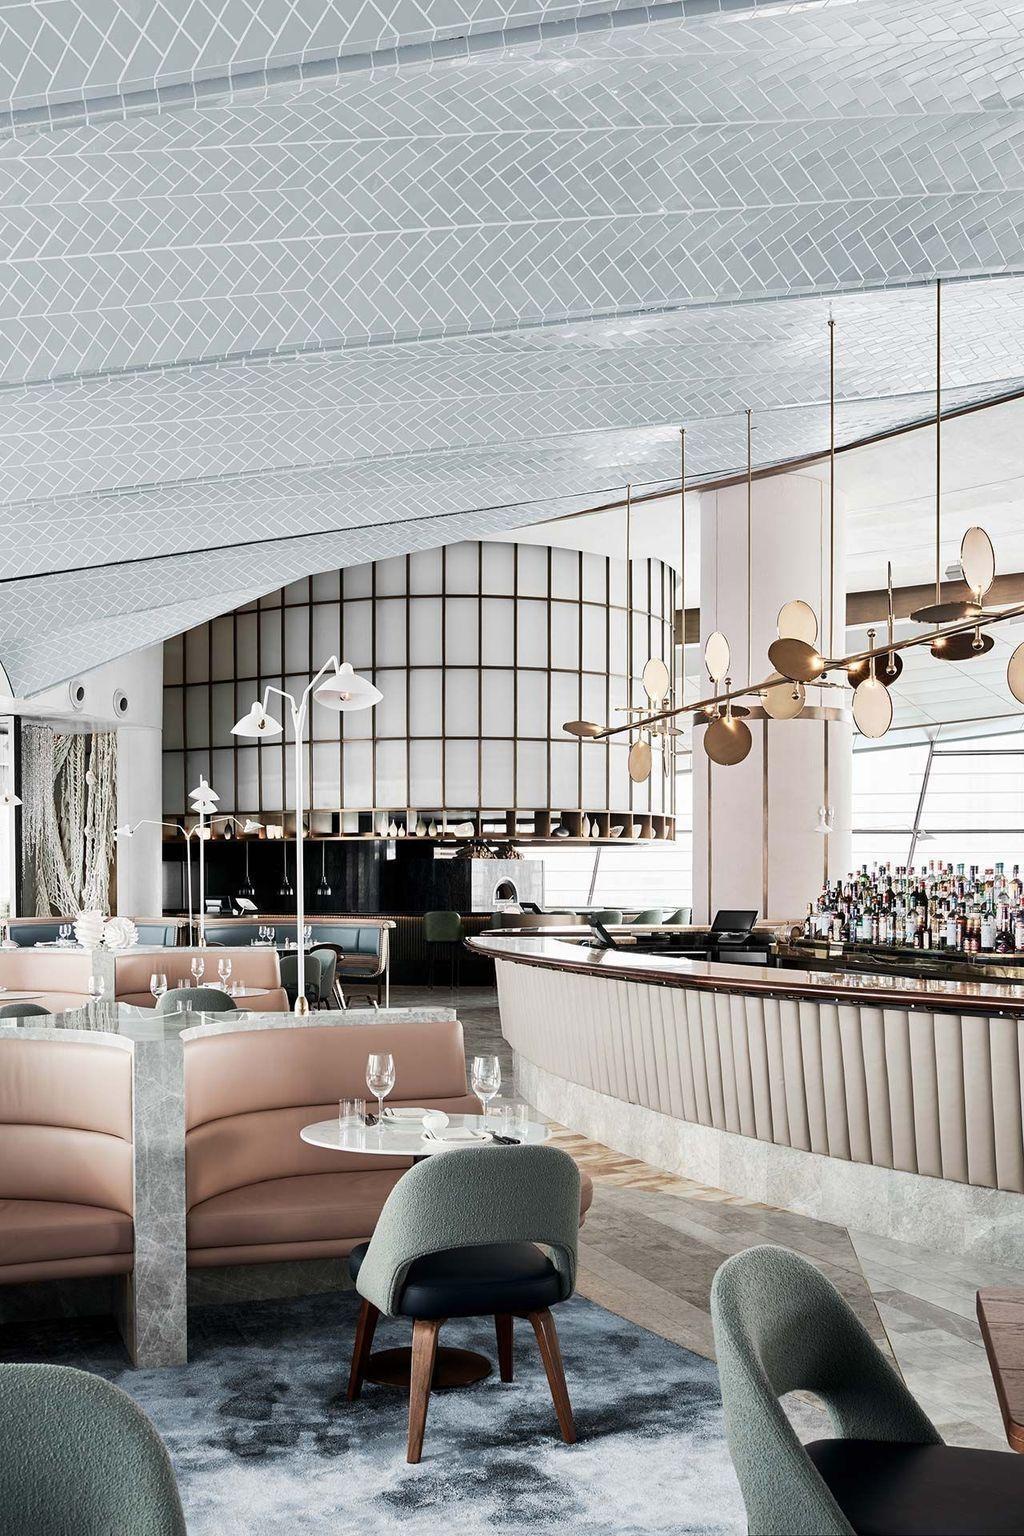 Best interior design inspirarions www delightfull eu visit us for best